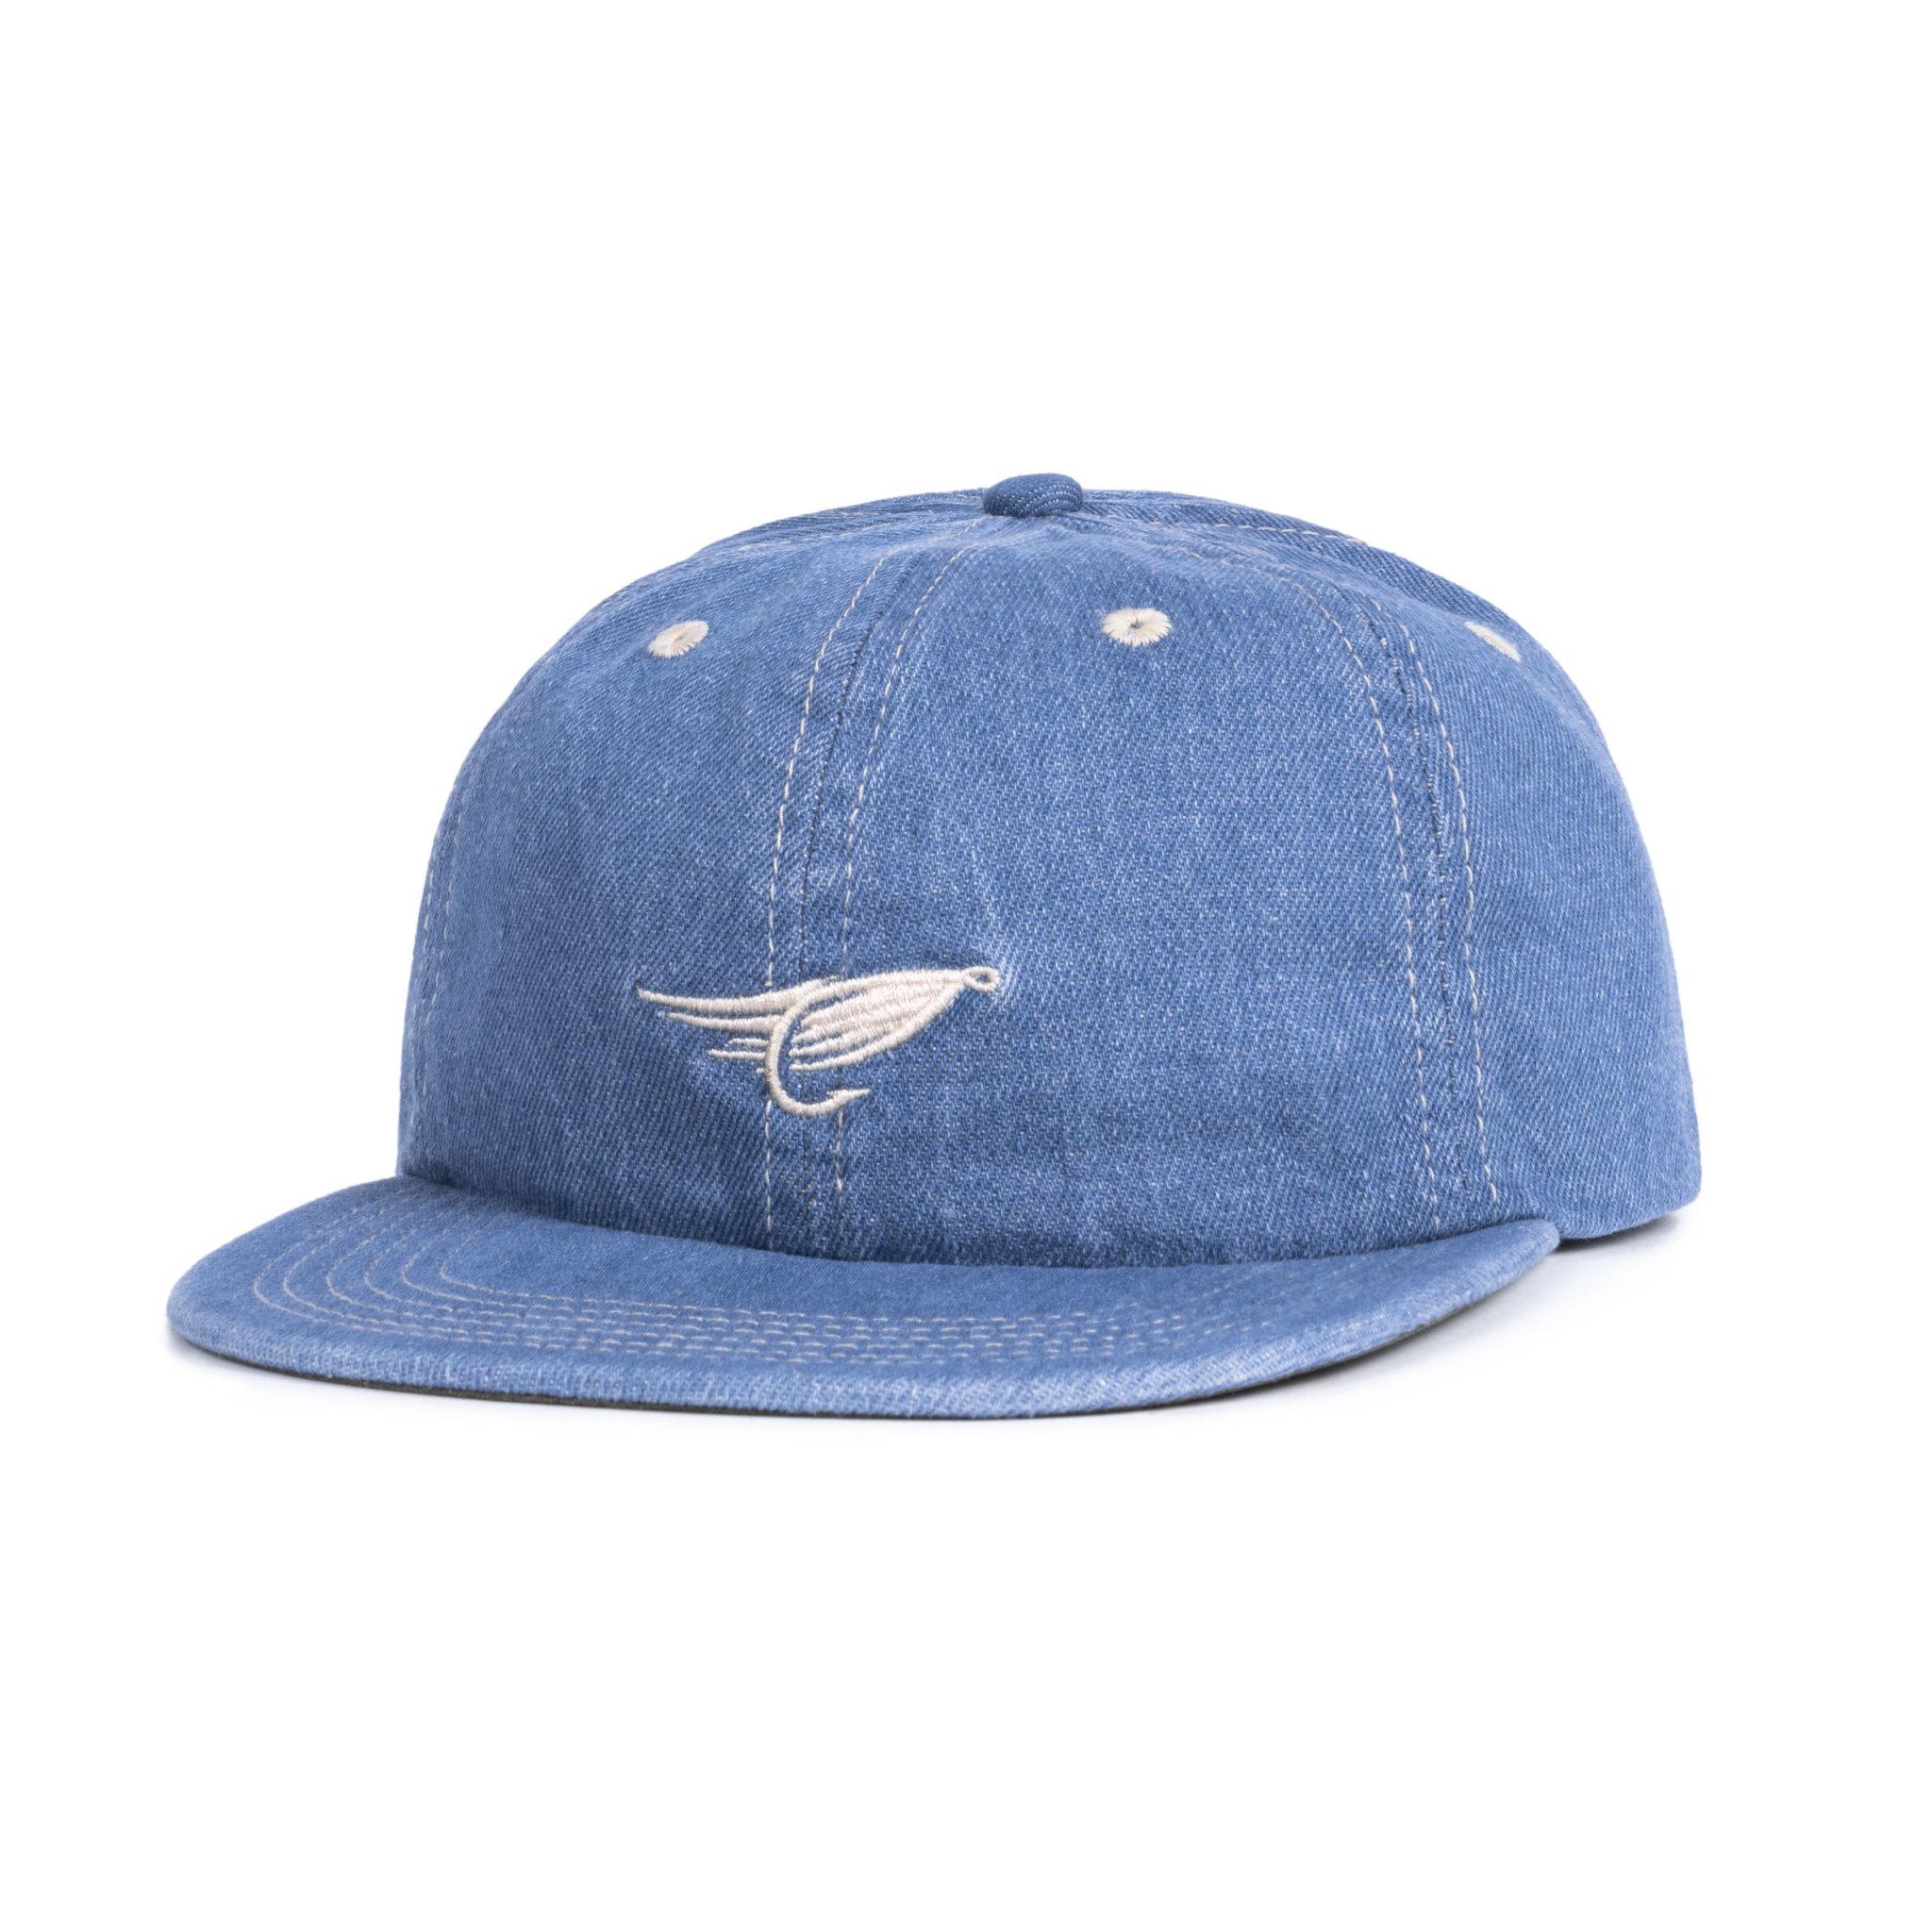 Fly Denim Strap Back  Blue Denim